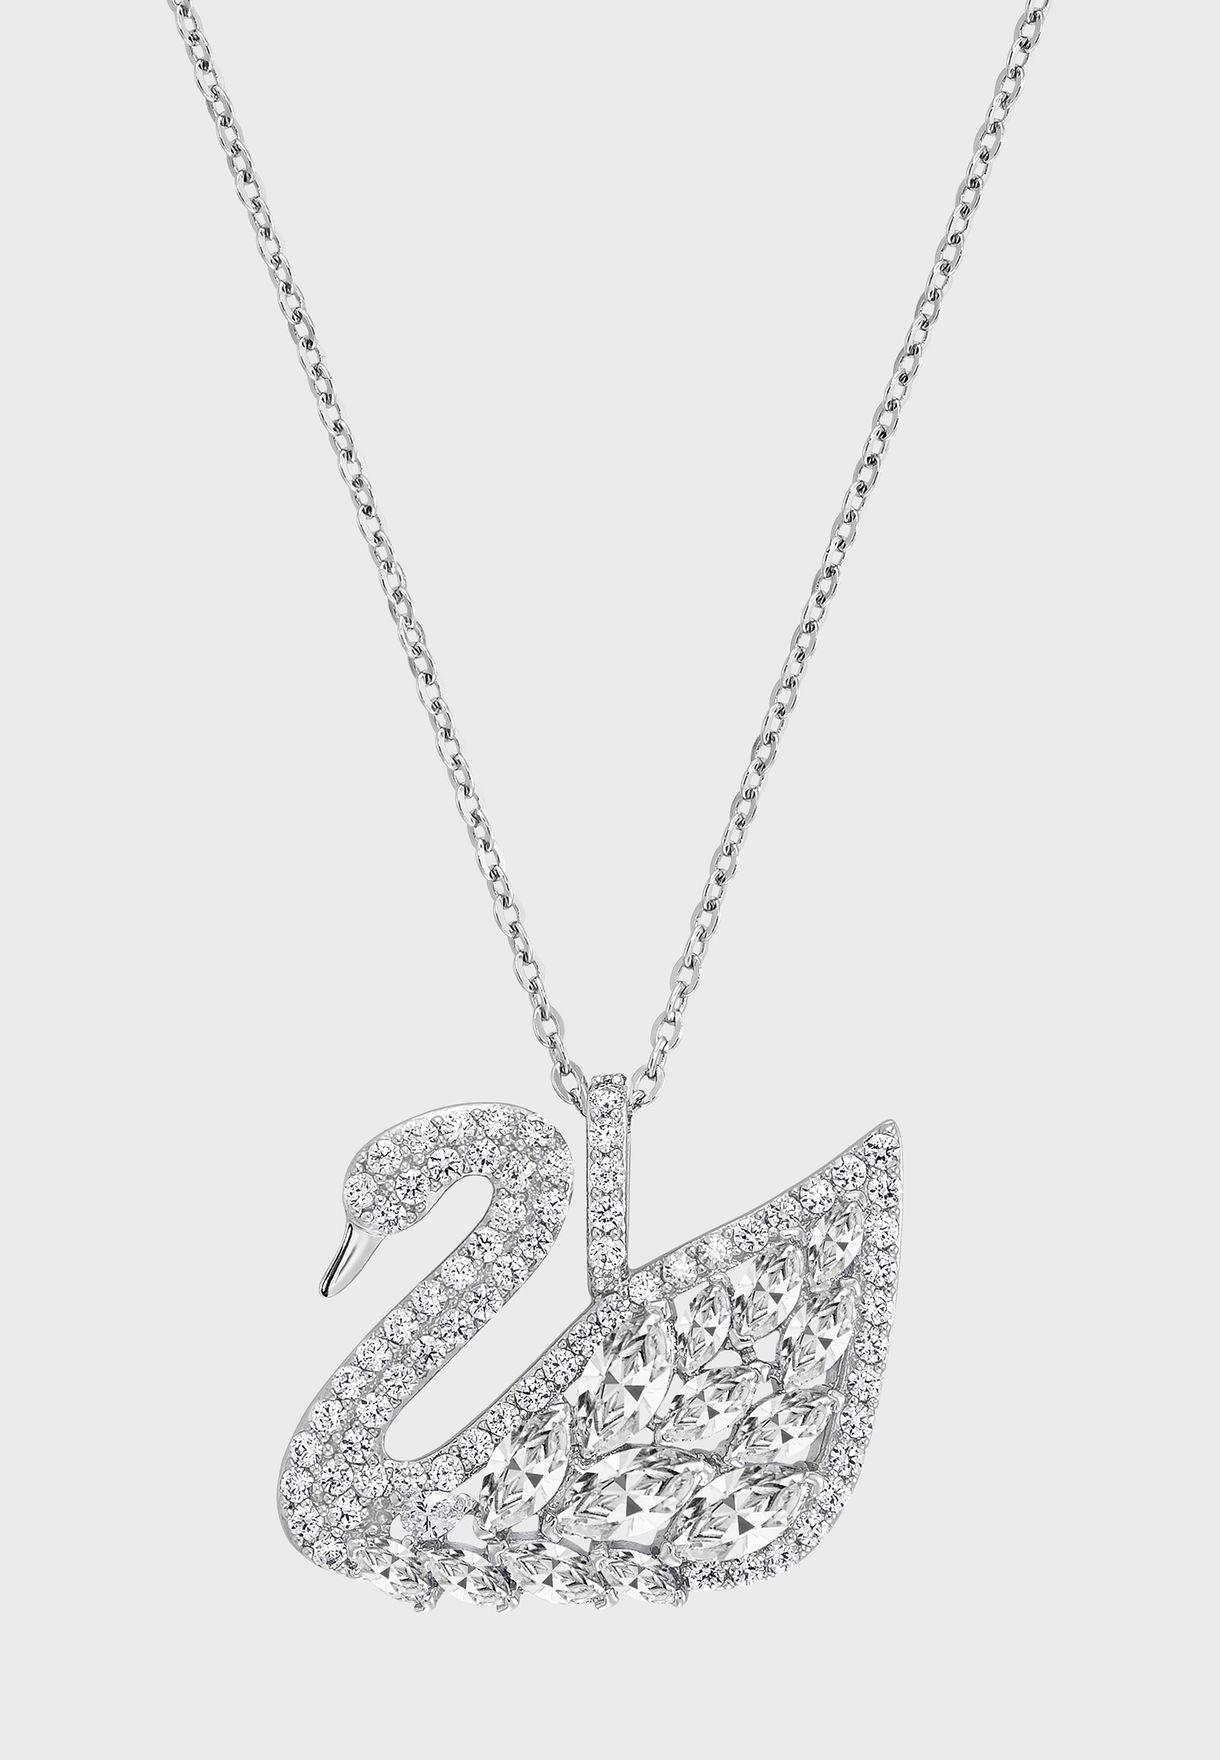 Swan Lake Necklace